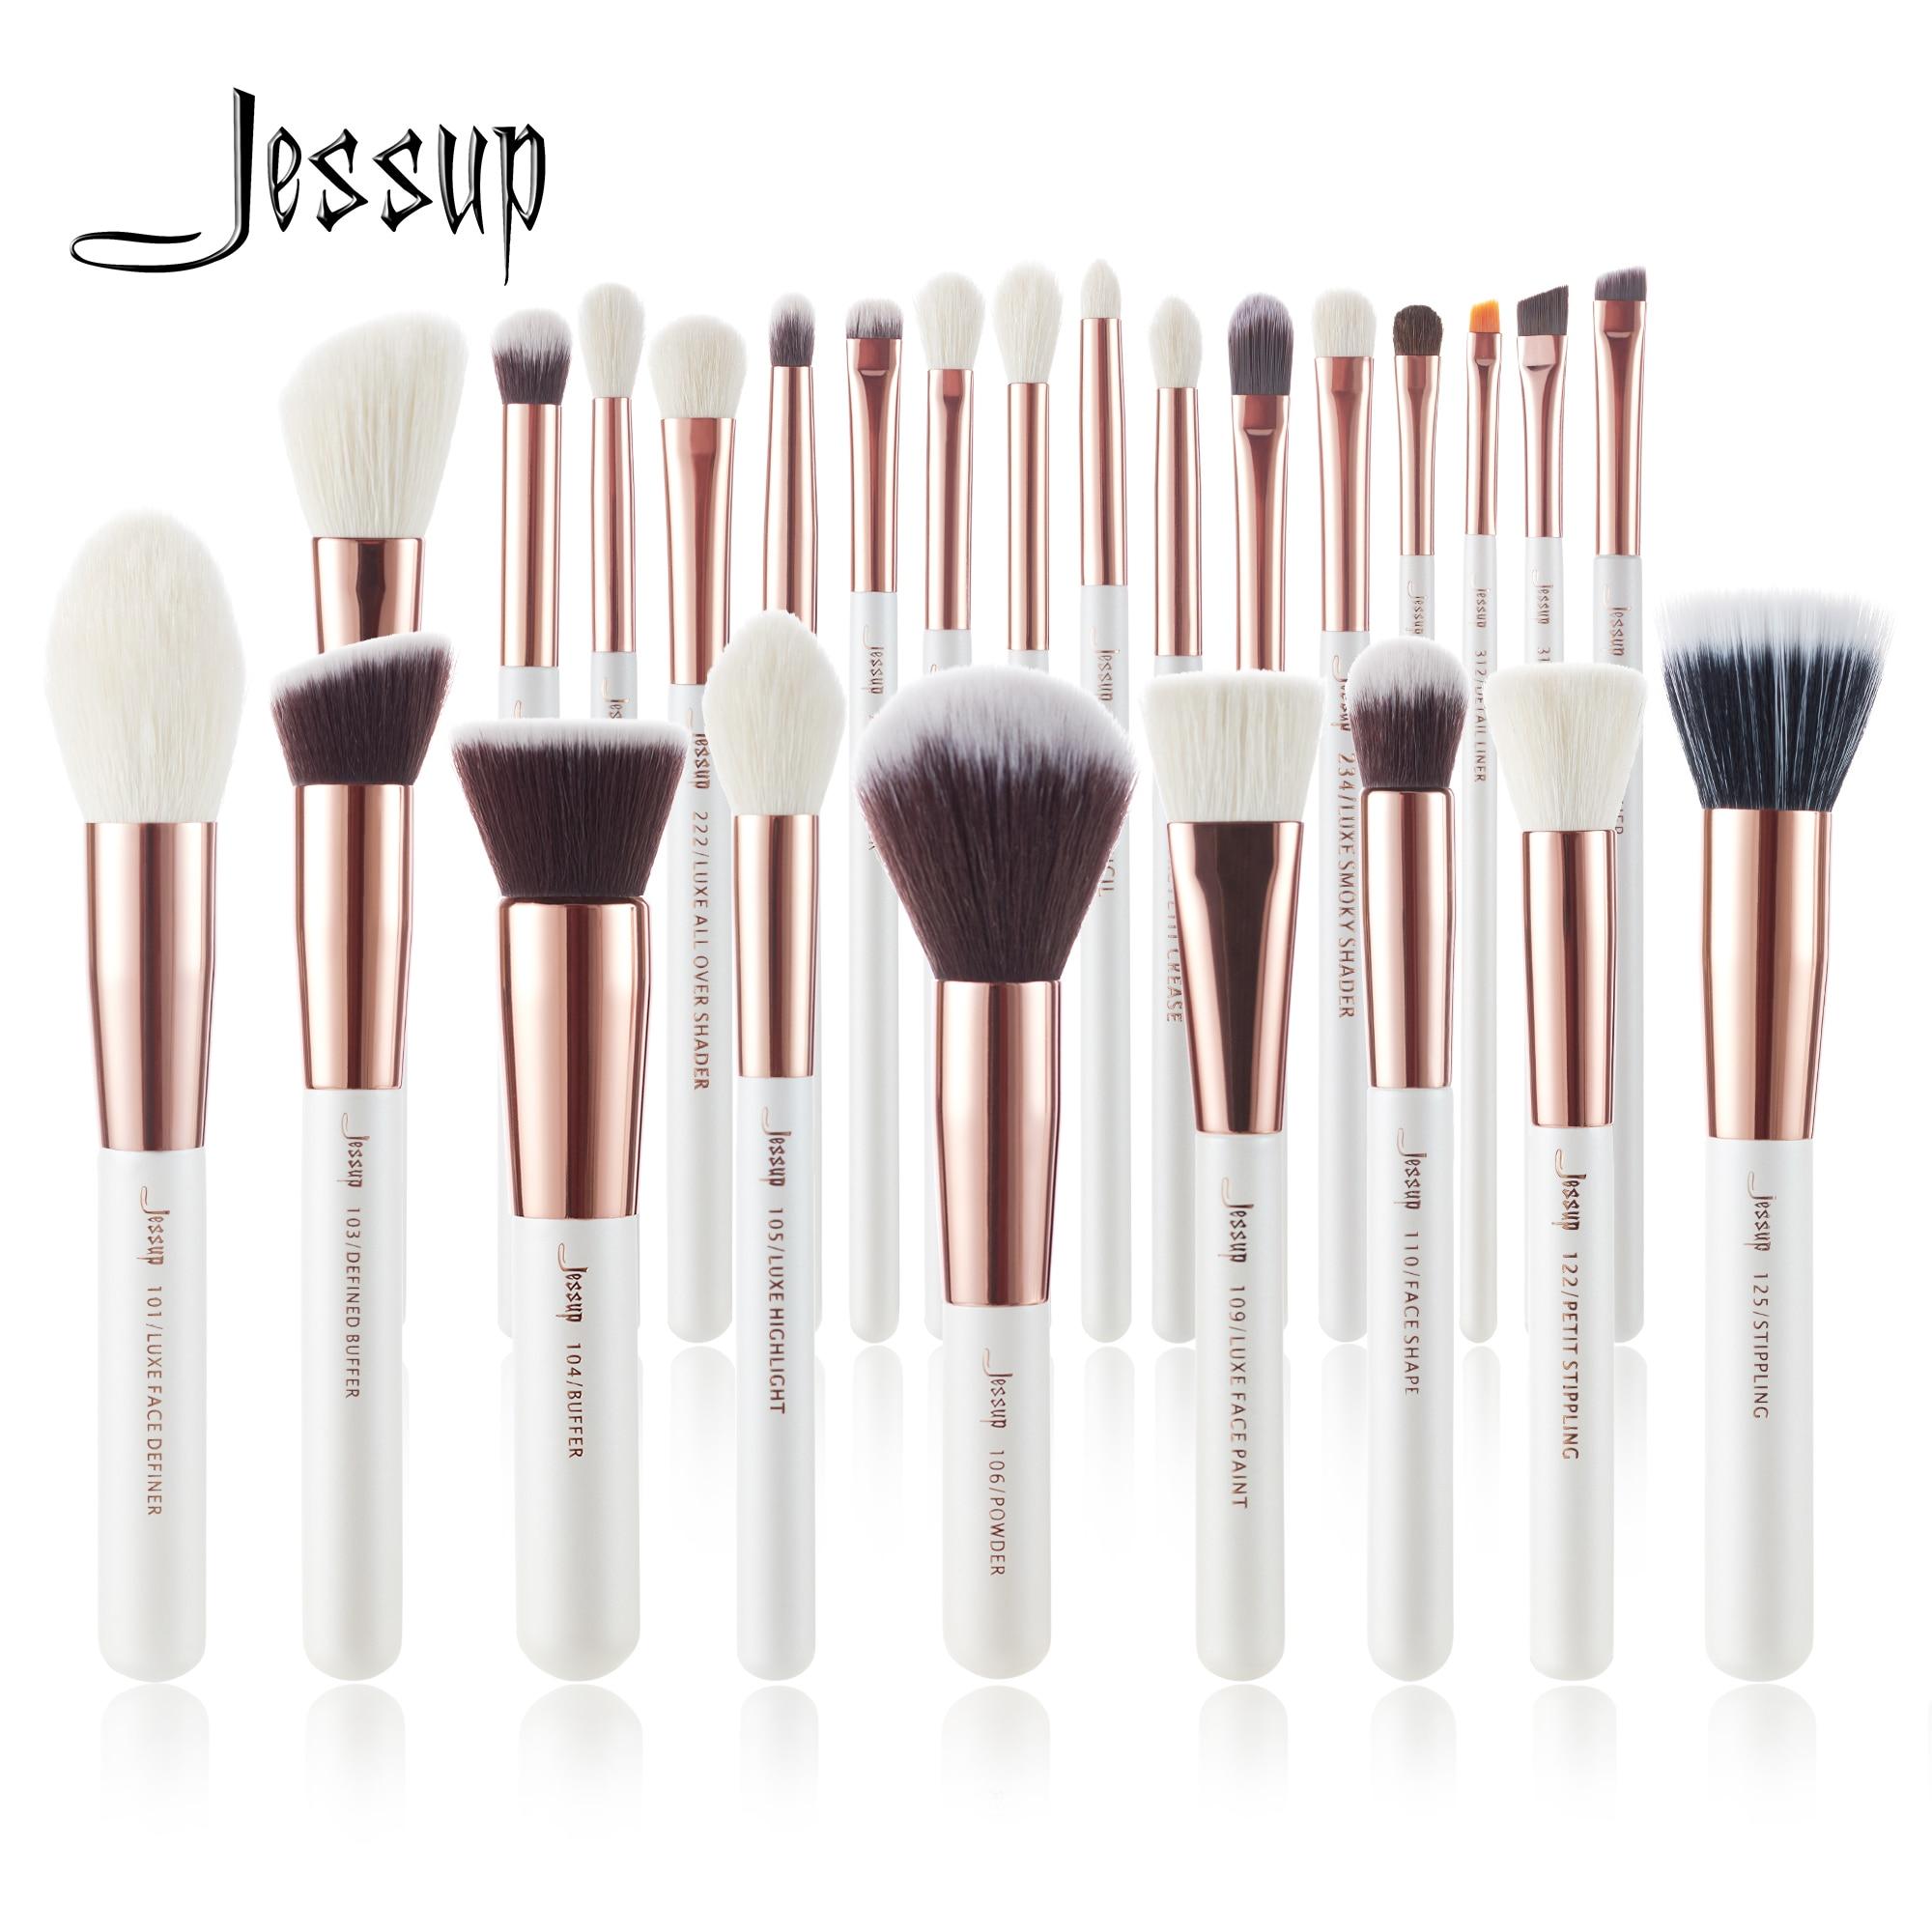 AliExpress - Jessup Makeup brushes set 6-25pcs Pearl White / Rose Gold Professional Make up brush Natural hair Foundation Powder Blushes